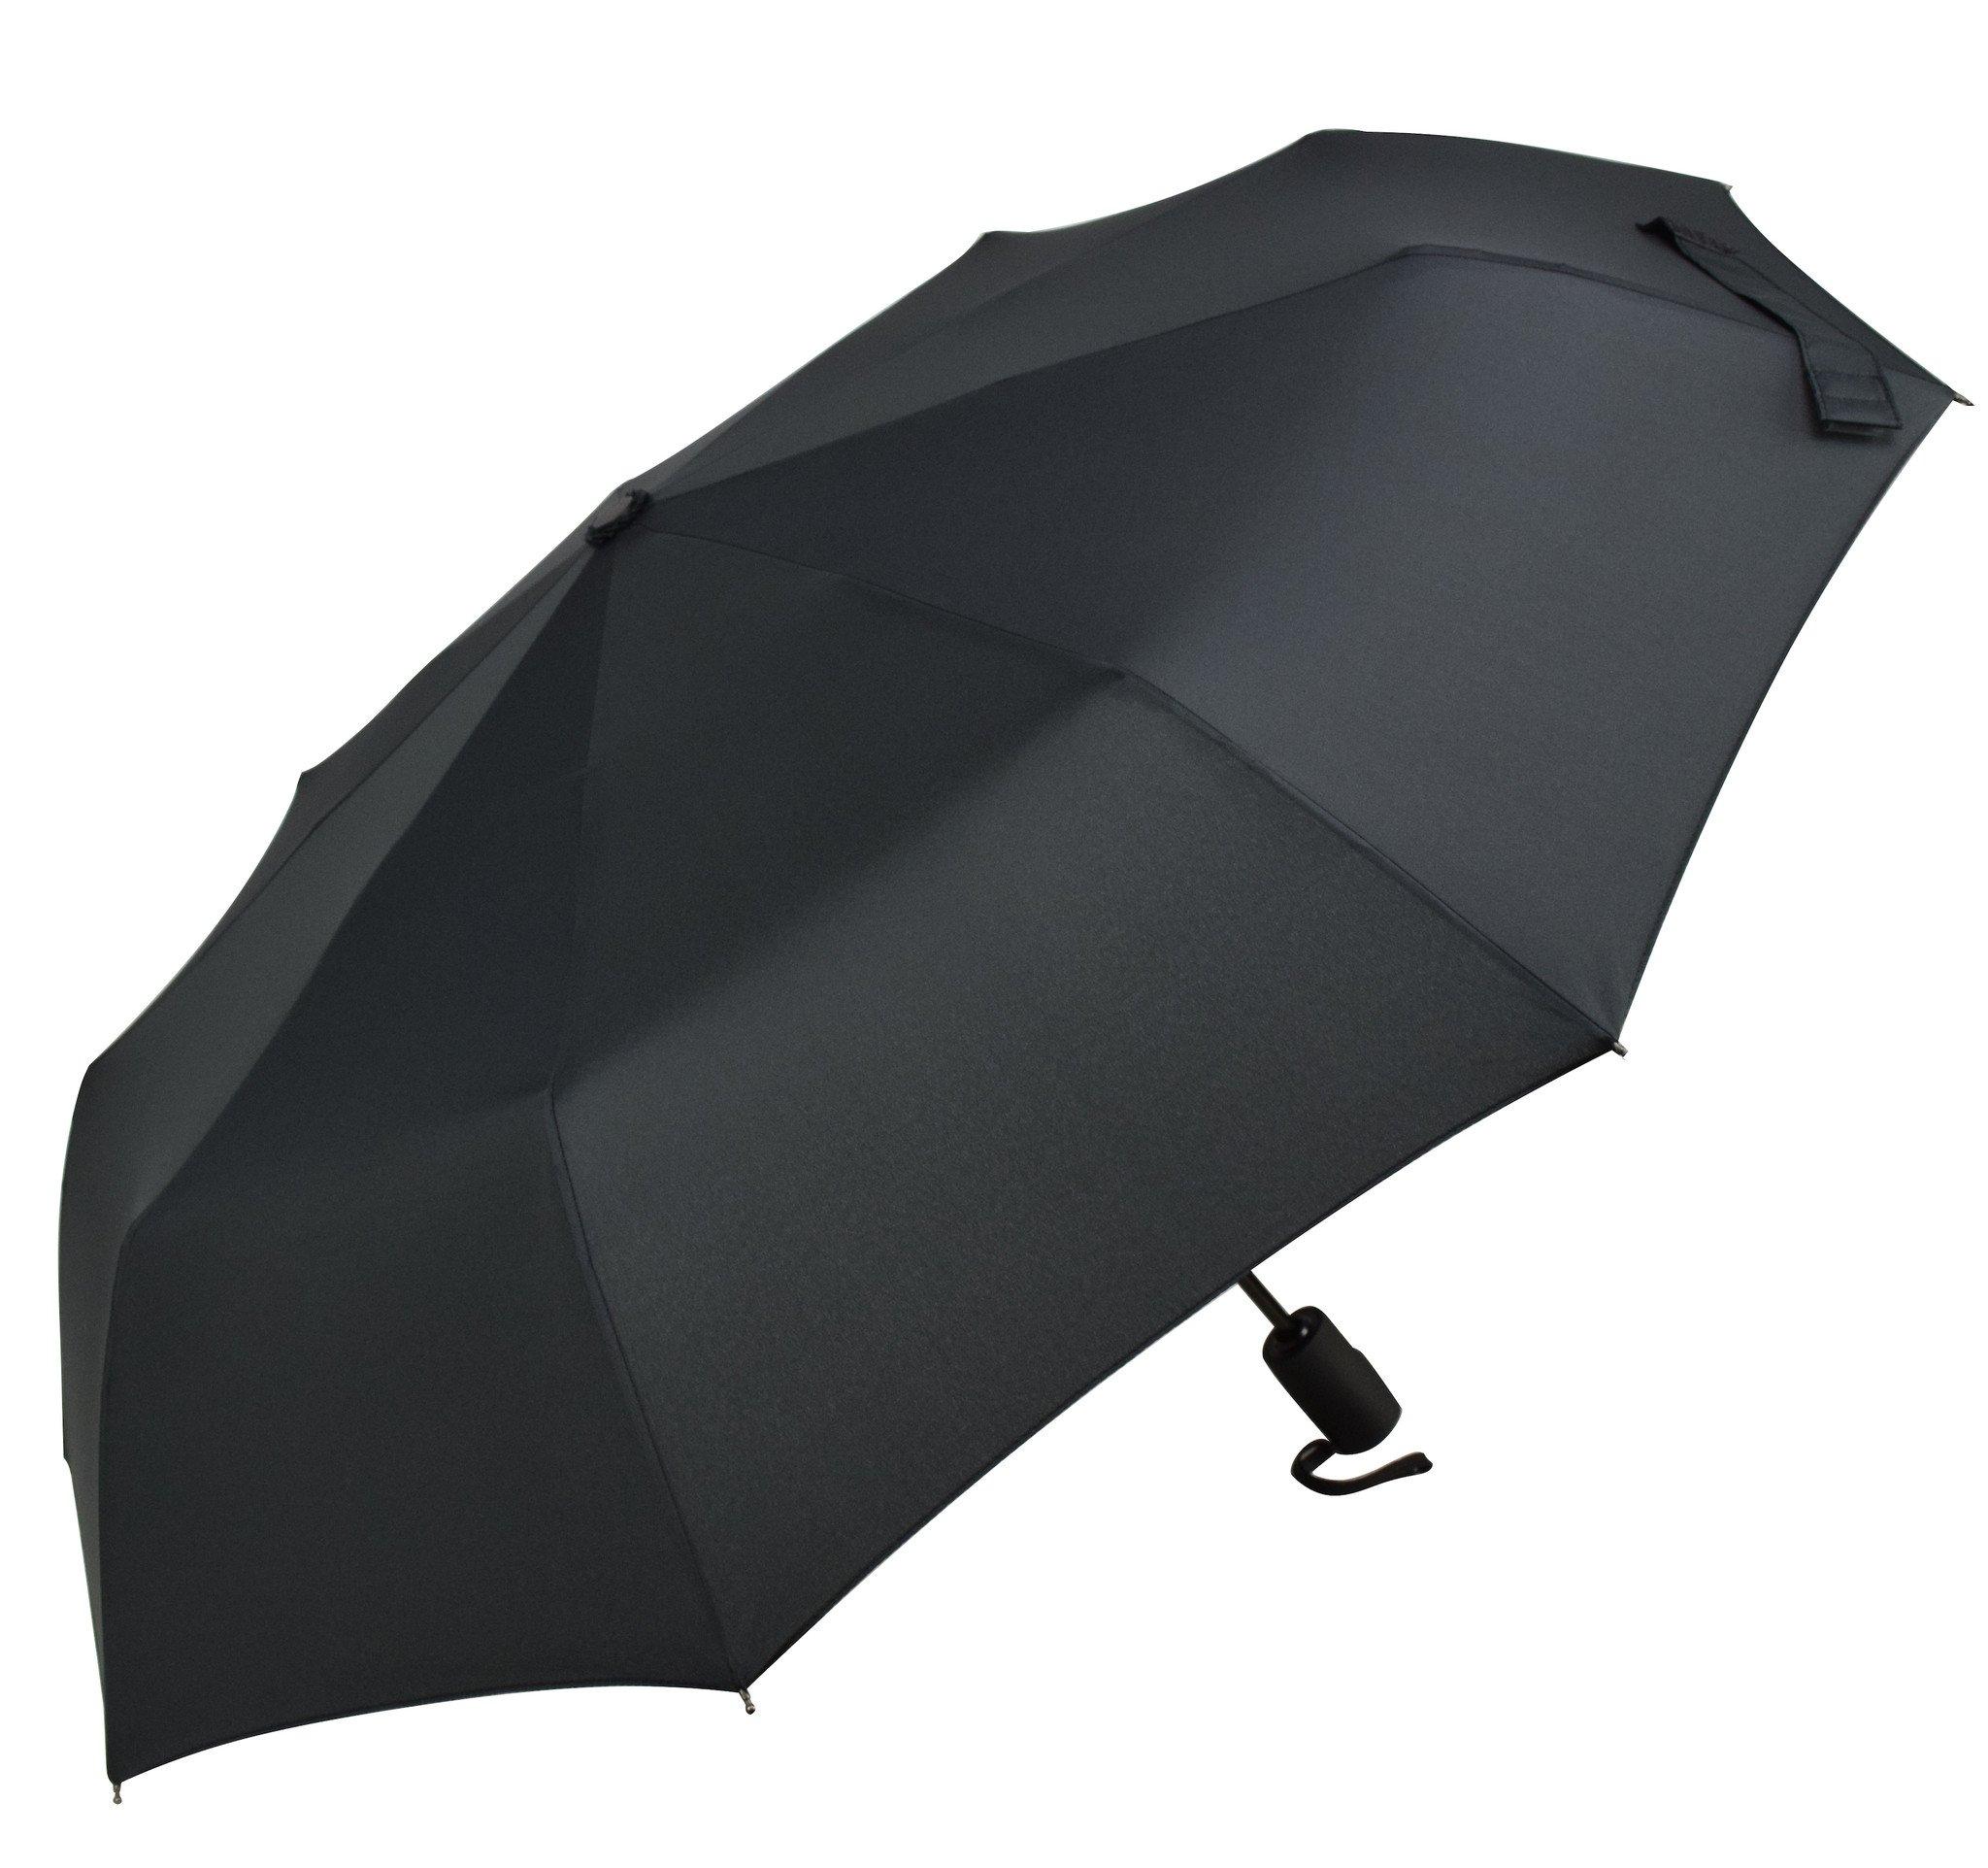 2048x1924 Lifetek Traveler 45 Umbrella High Quality Umbrella Wind